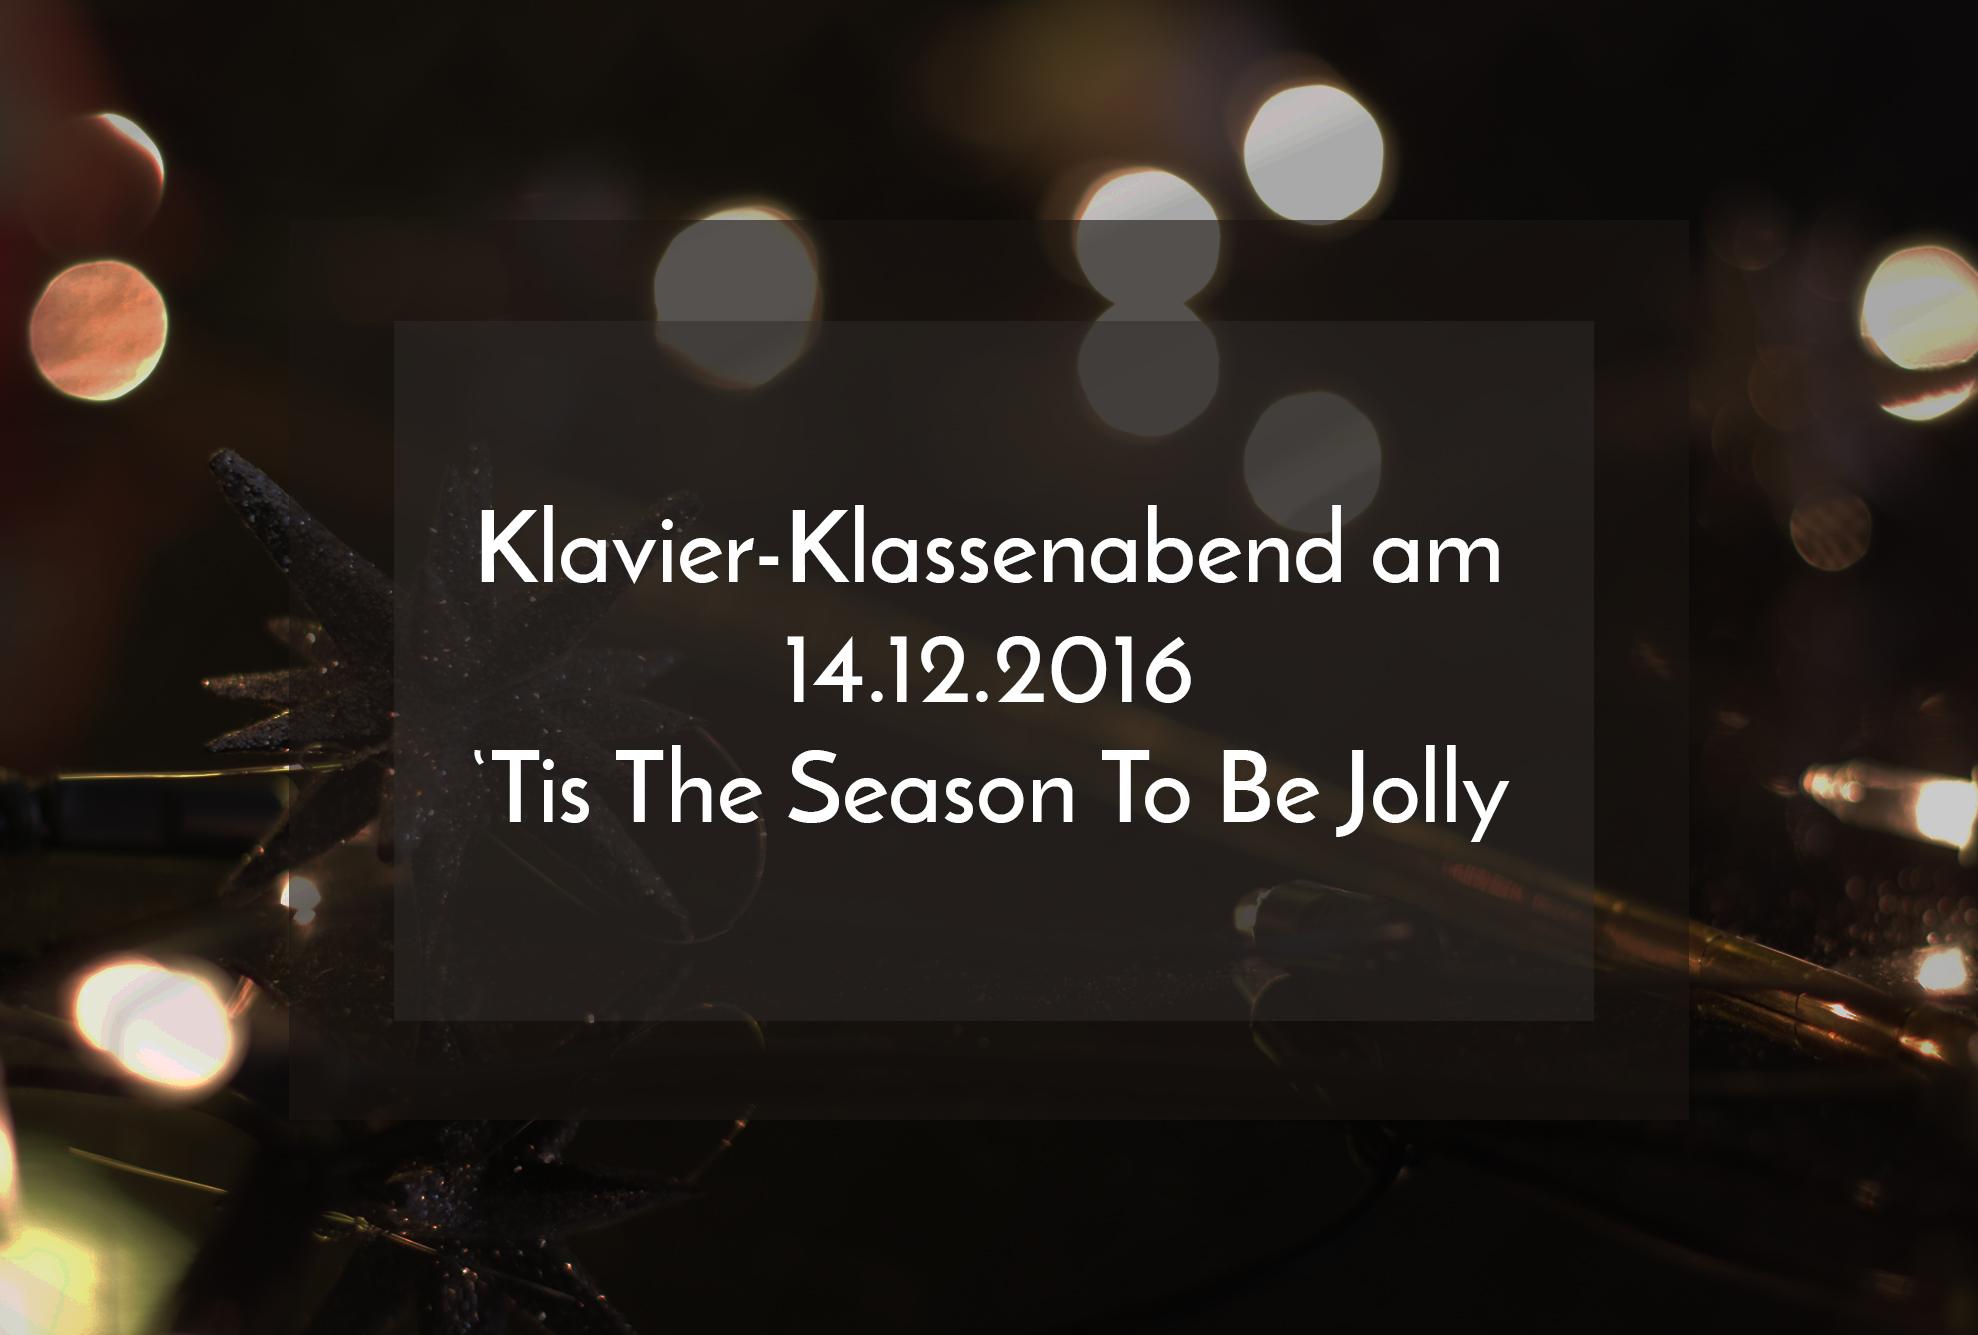 Klavier-Klassenabend am 14.12.2016: 'Tis The Season To Be Jolly